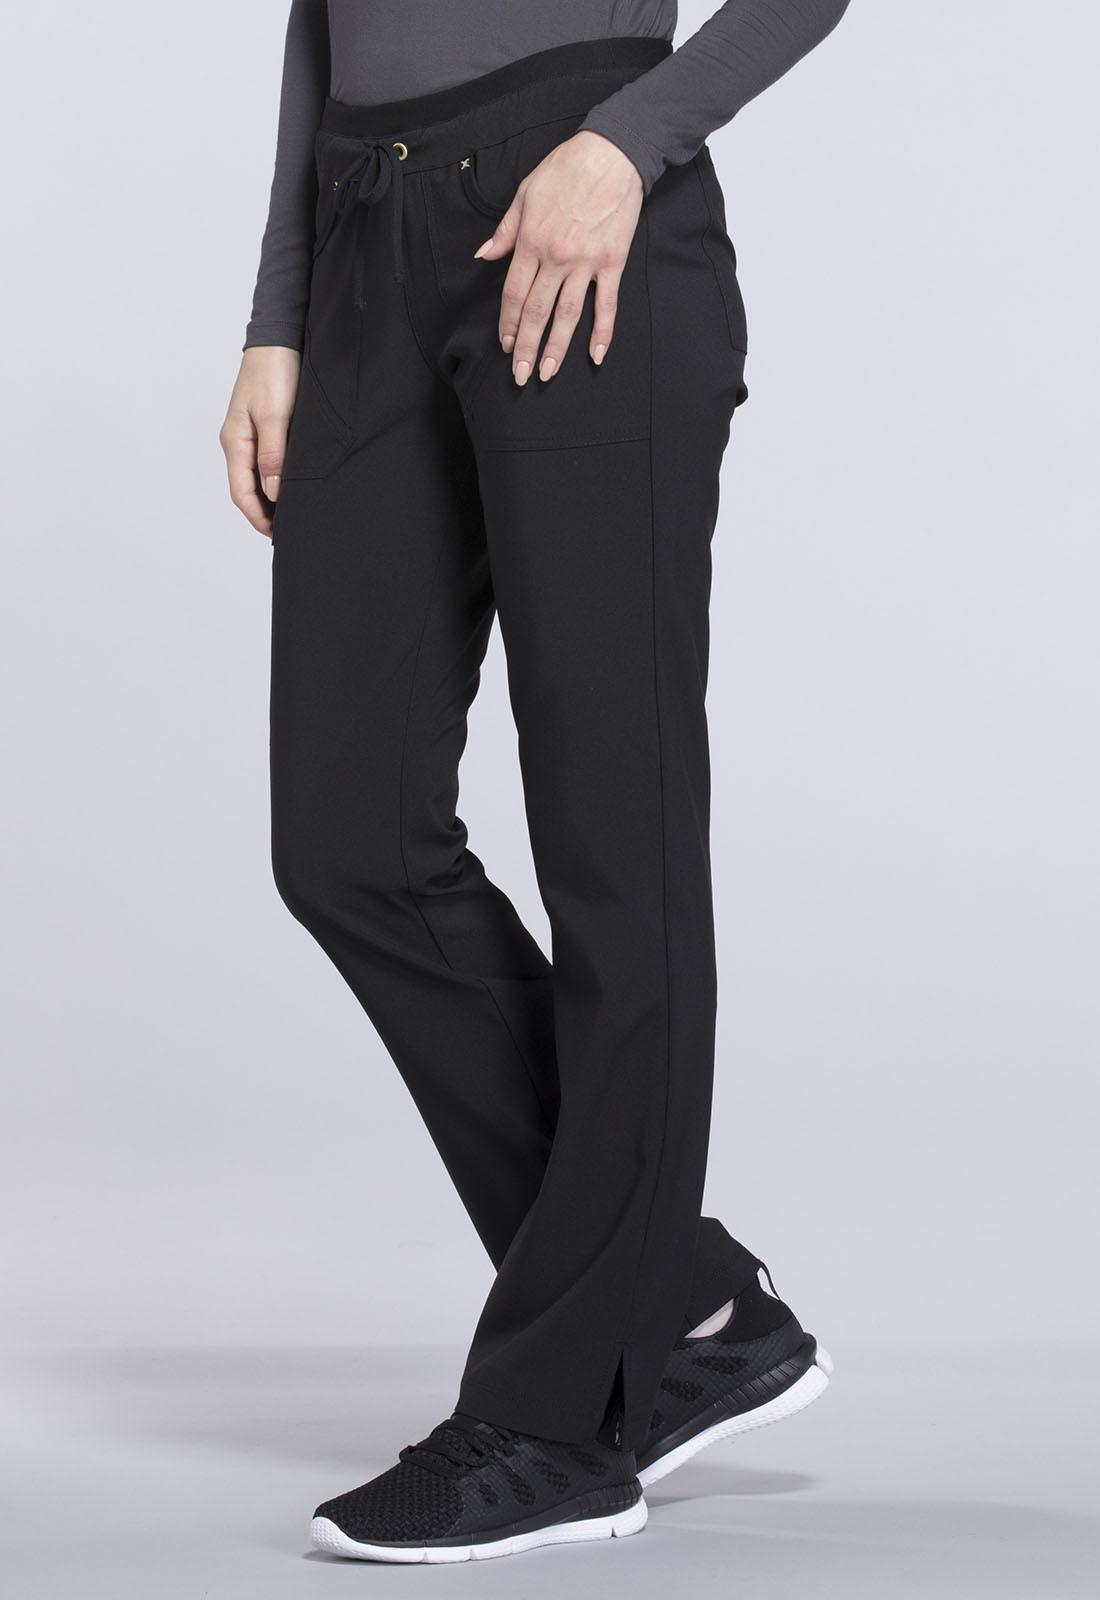 CHEROKEE Drawstring Pants Black CK010P-BLK-M